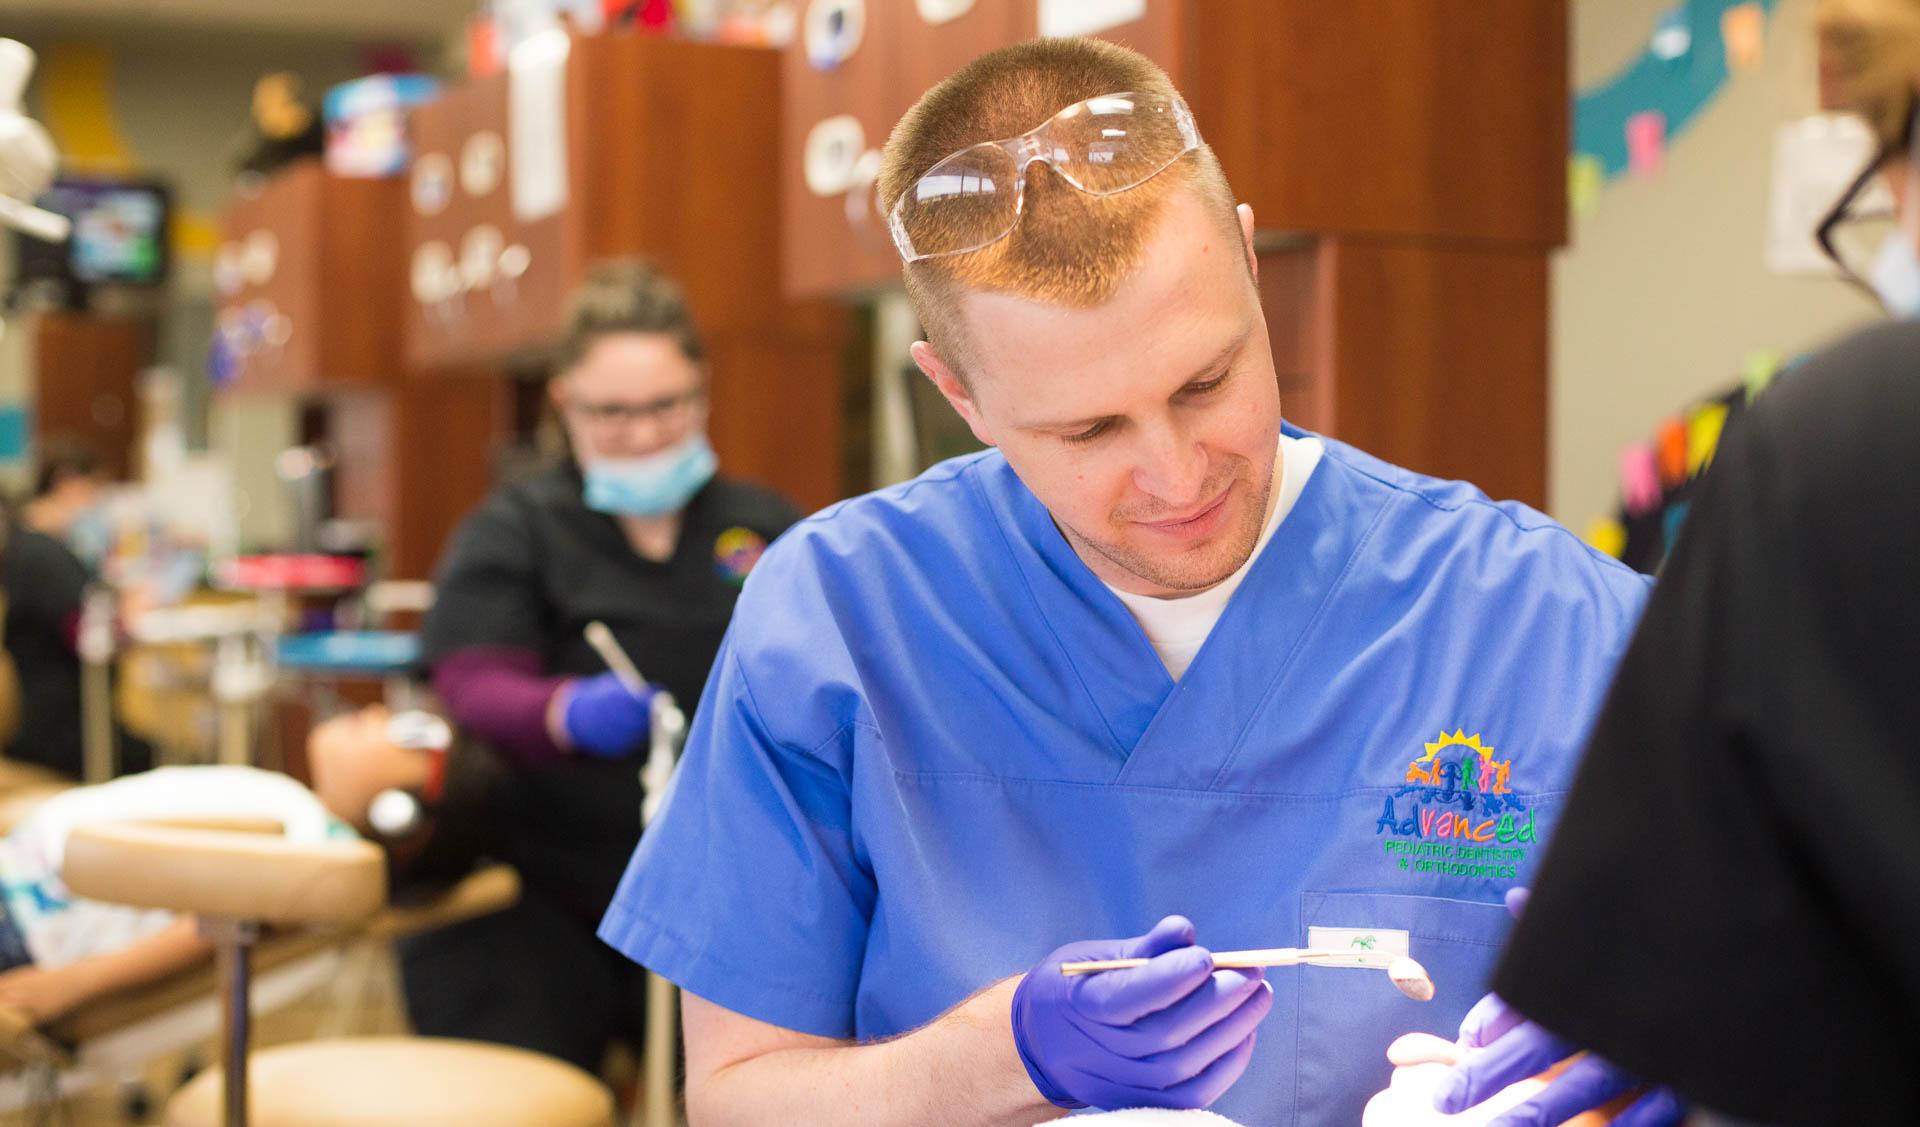 Advanced Pediatrci Dentistry and Orthodontics Pasco Washington Kids dentist best healthiest freindlyest -7049.jpg